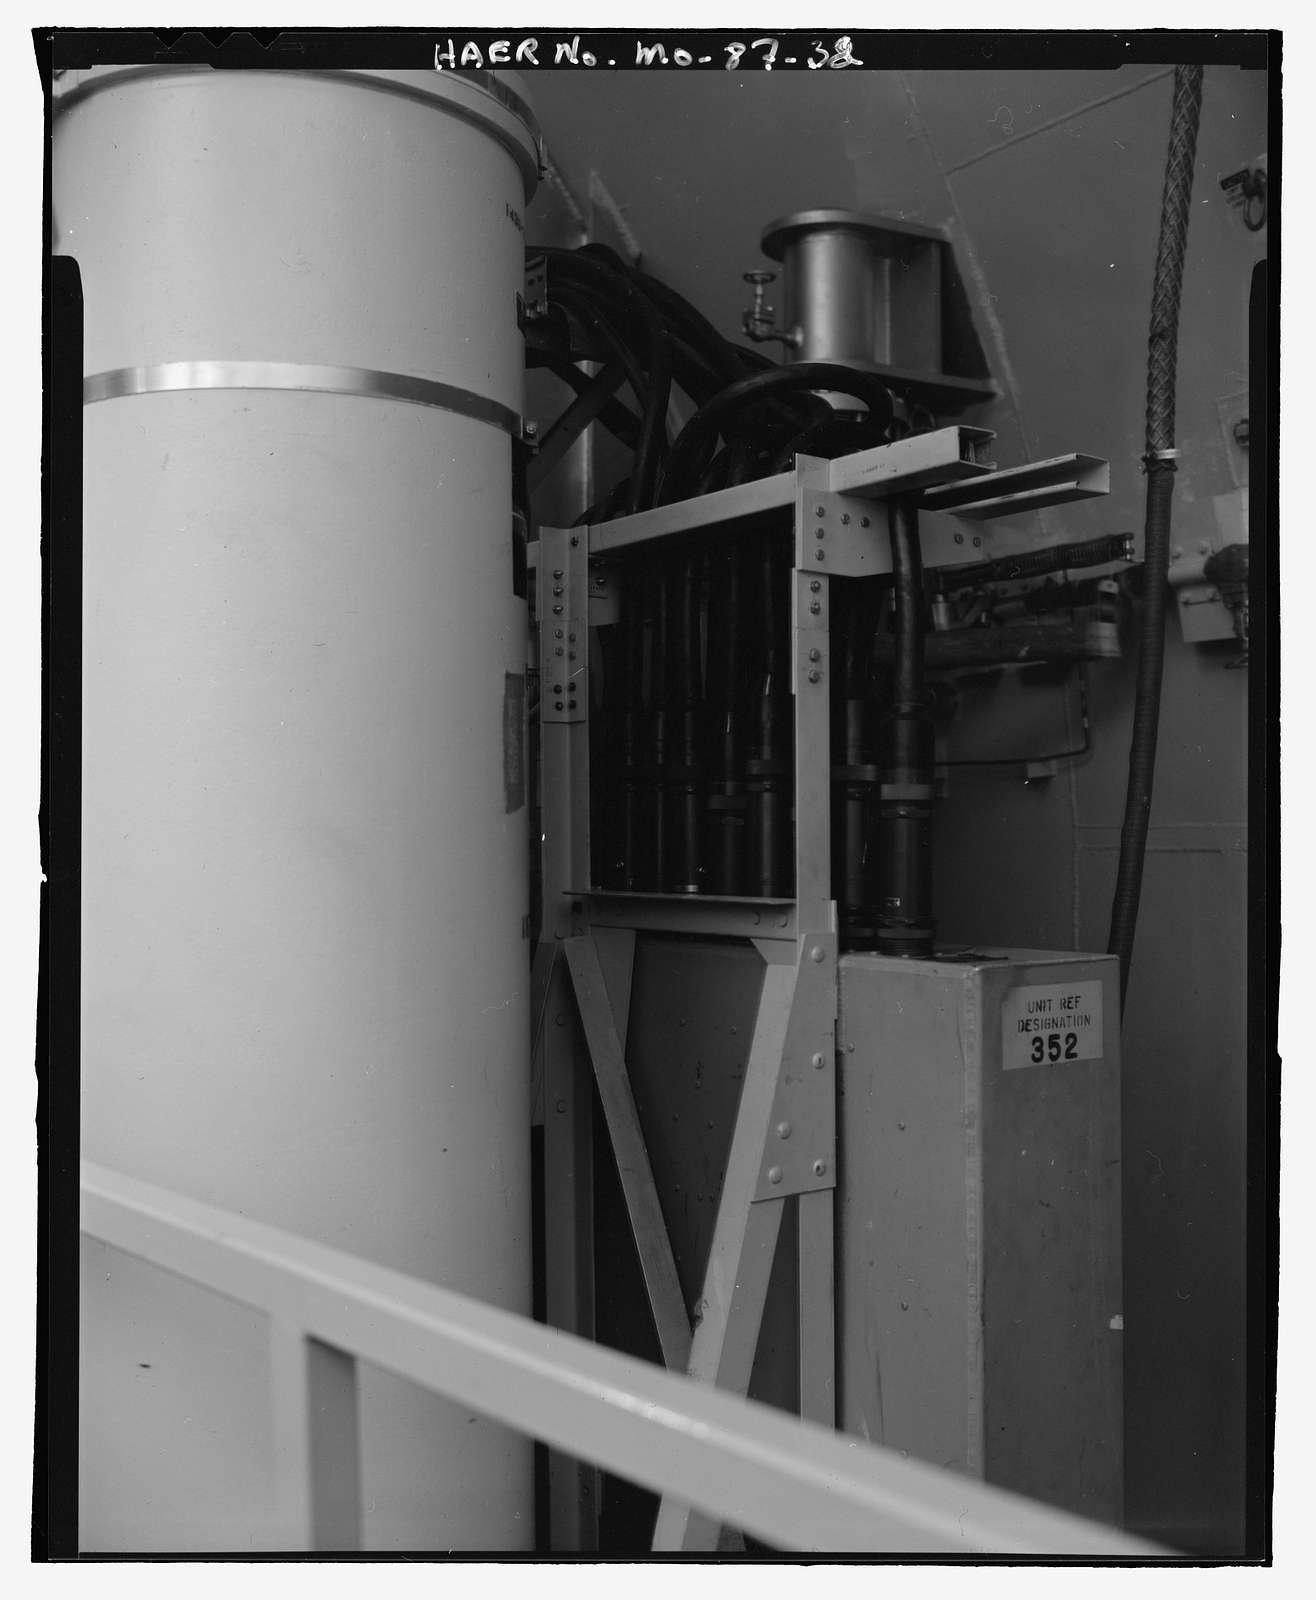 Whiteman Air Force Base, Oscar O-1 Minuteman Missile Alert Facility, Southeast corner of Twelfth & Vendenberg Avenues, Knob Noster, Johnson County, MO